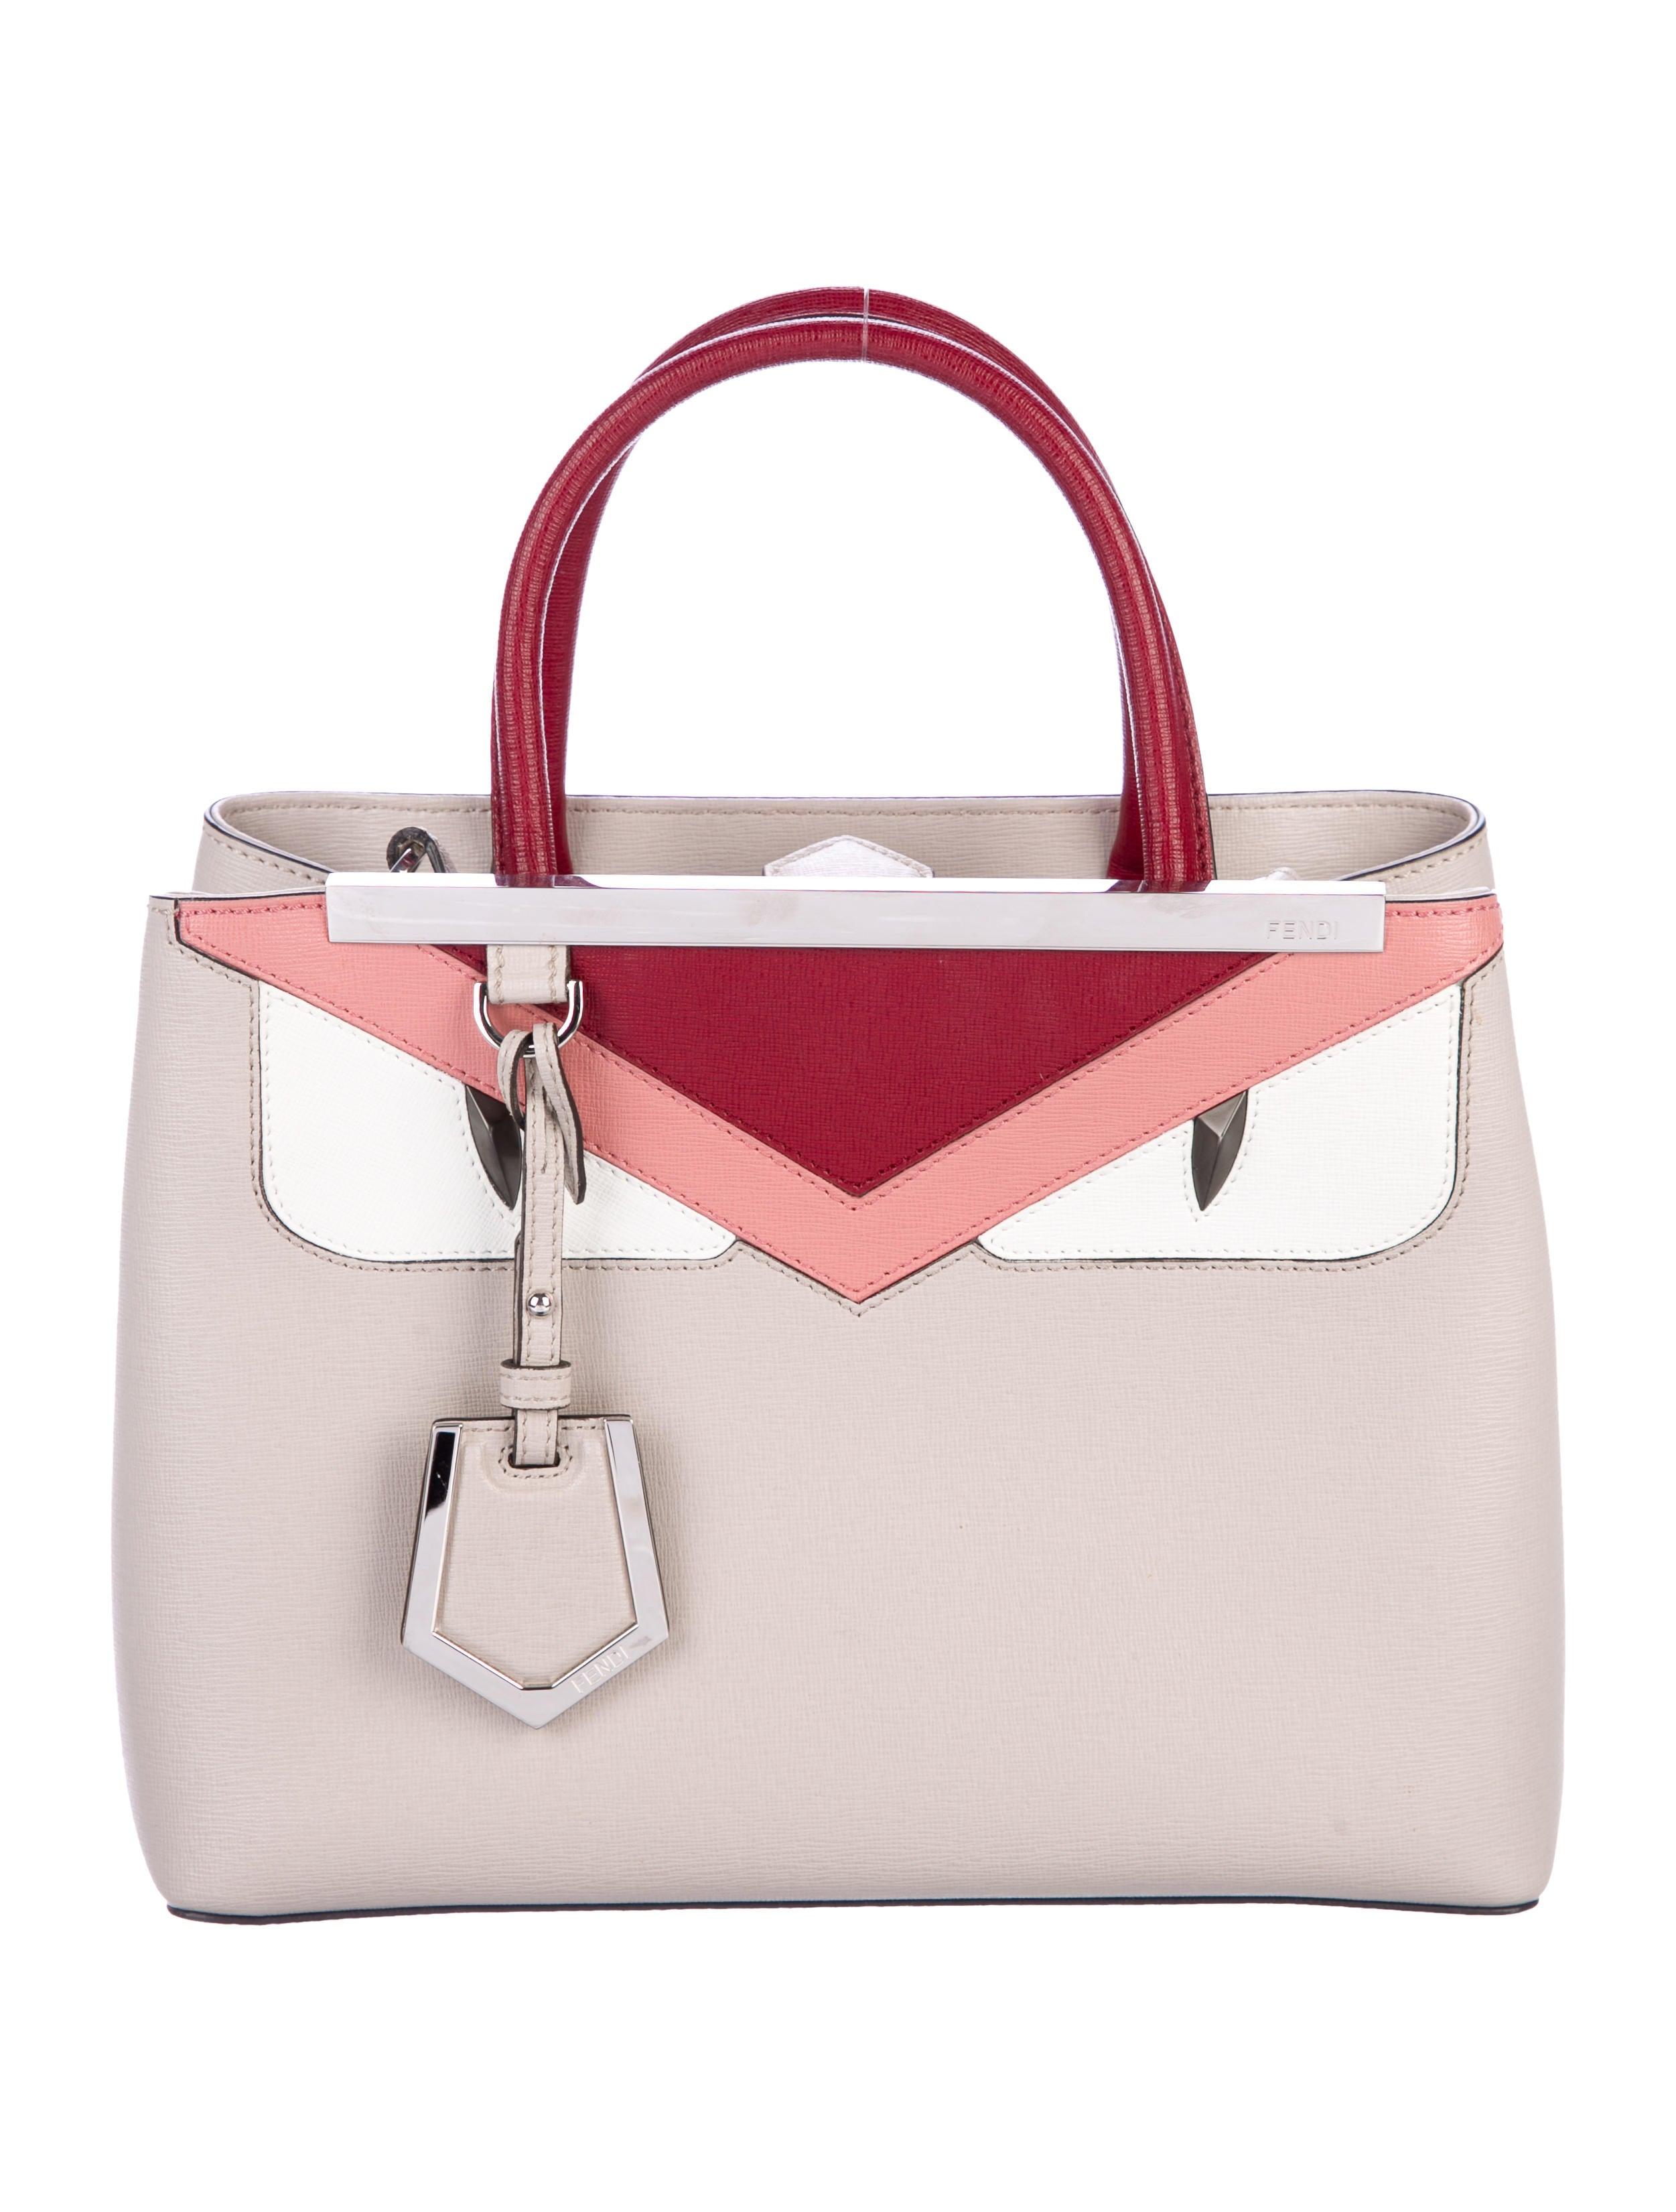 2a170ada47b3 Fendi Petite 2Jours Monster Satchel - Handbags - FEN86958